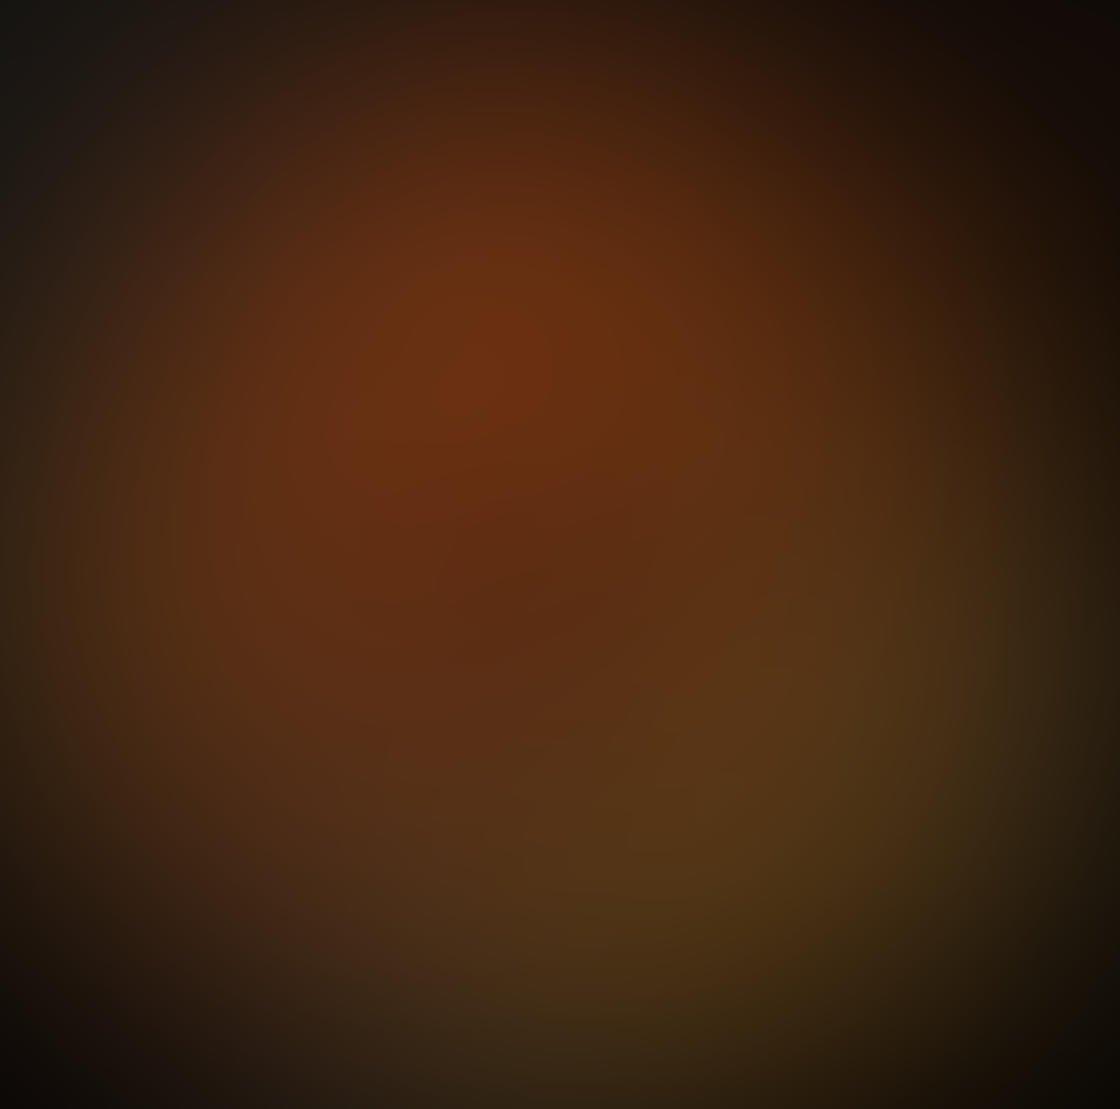 Still Life iPhone Photo Subjects 29